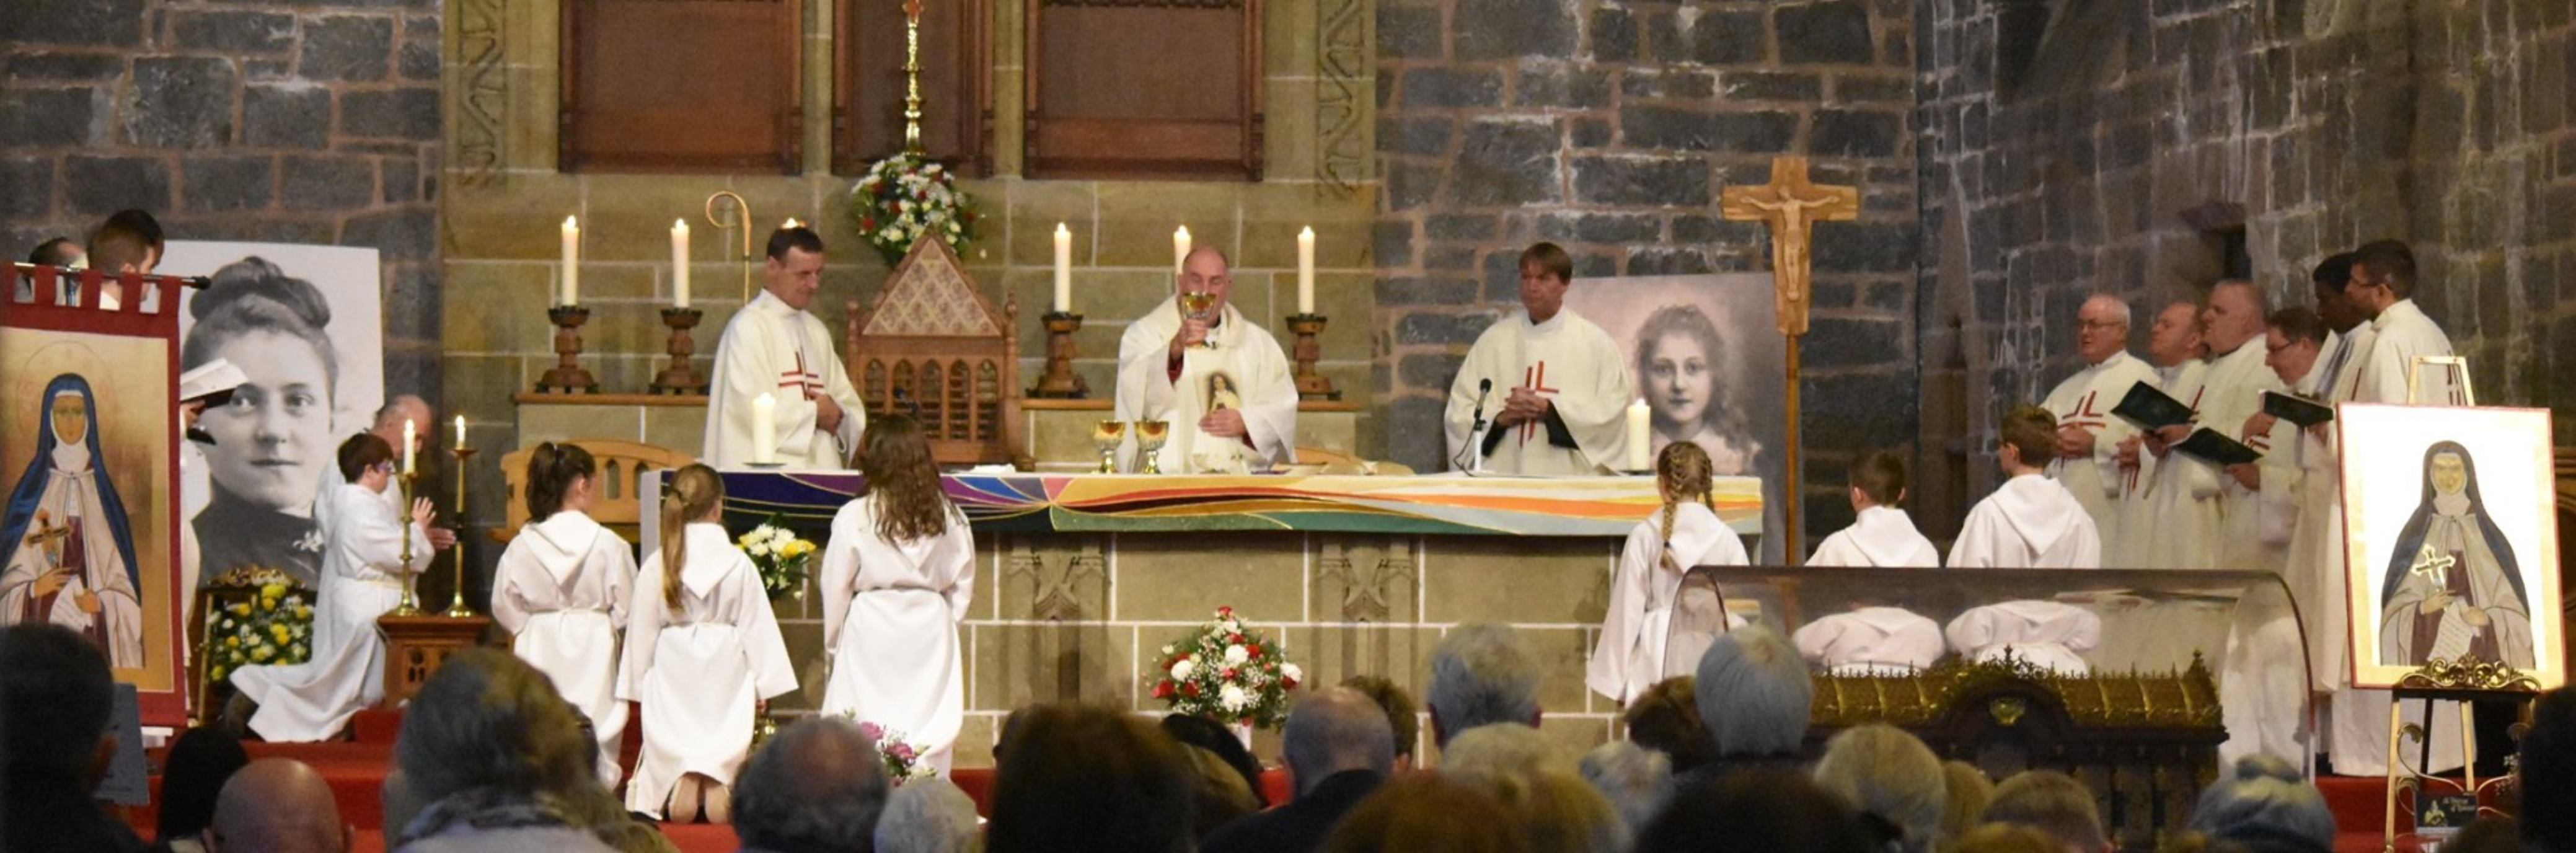 Visit of the Relics of St Thérèse